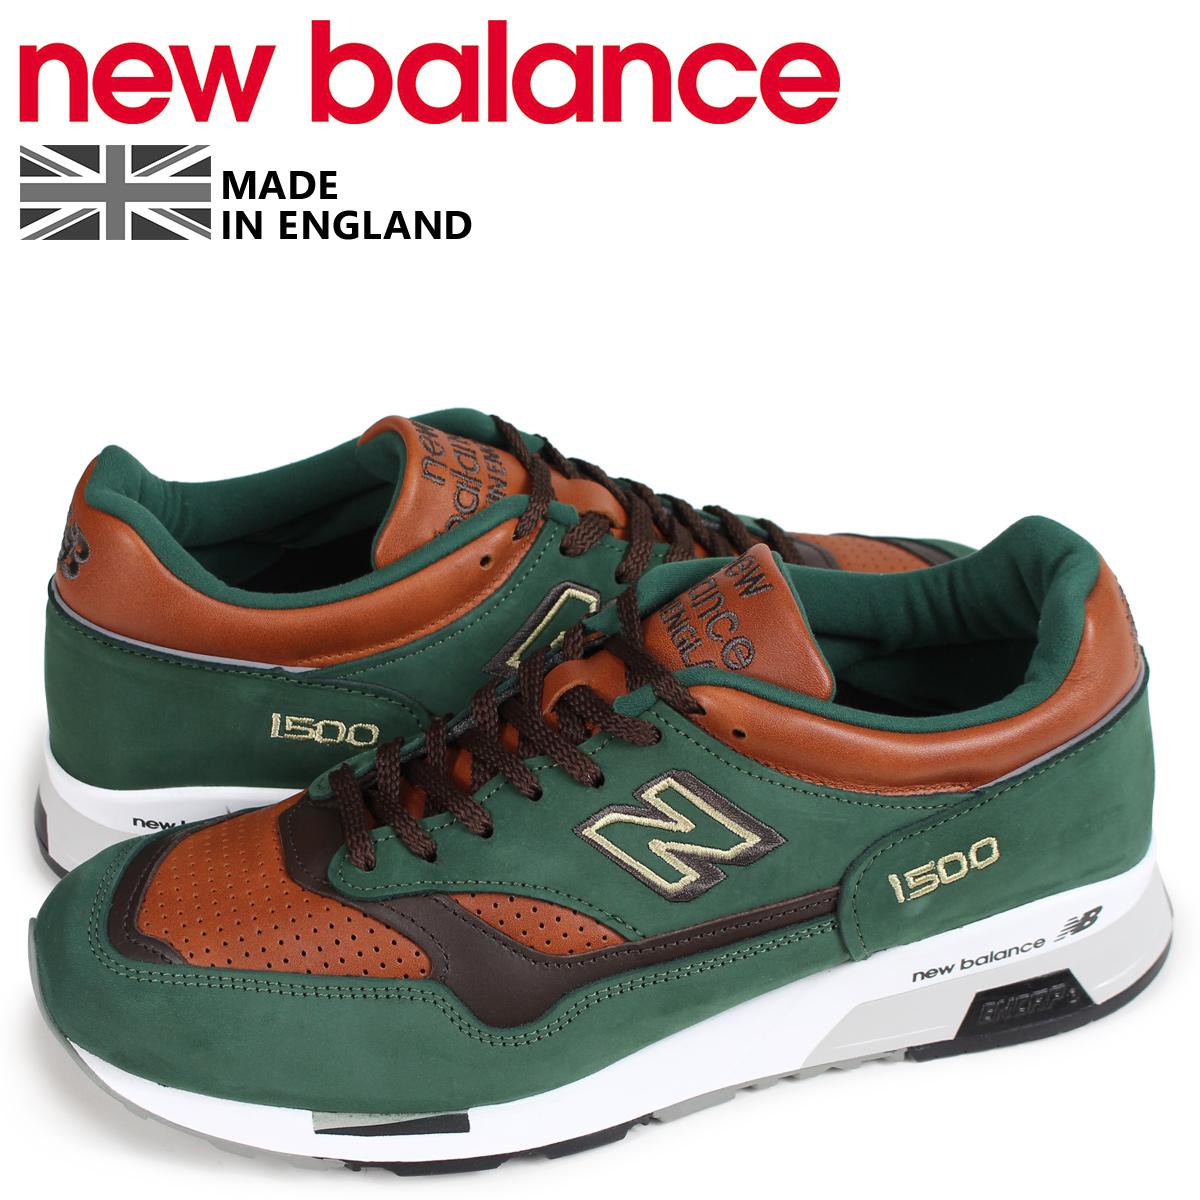 nb 1500 green